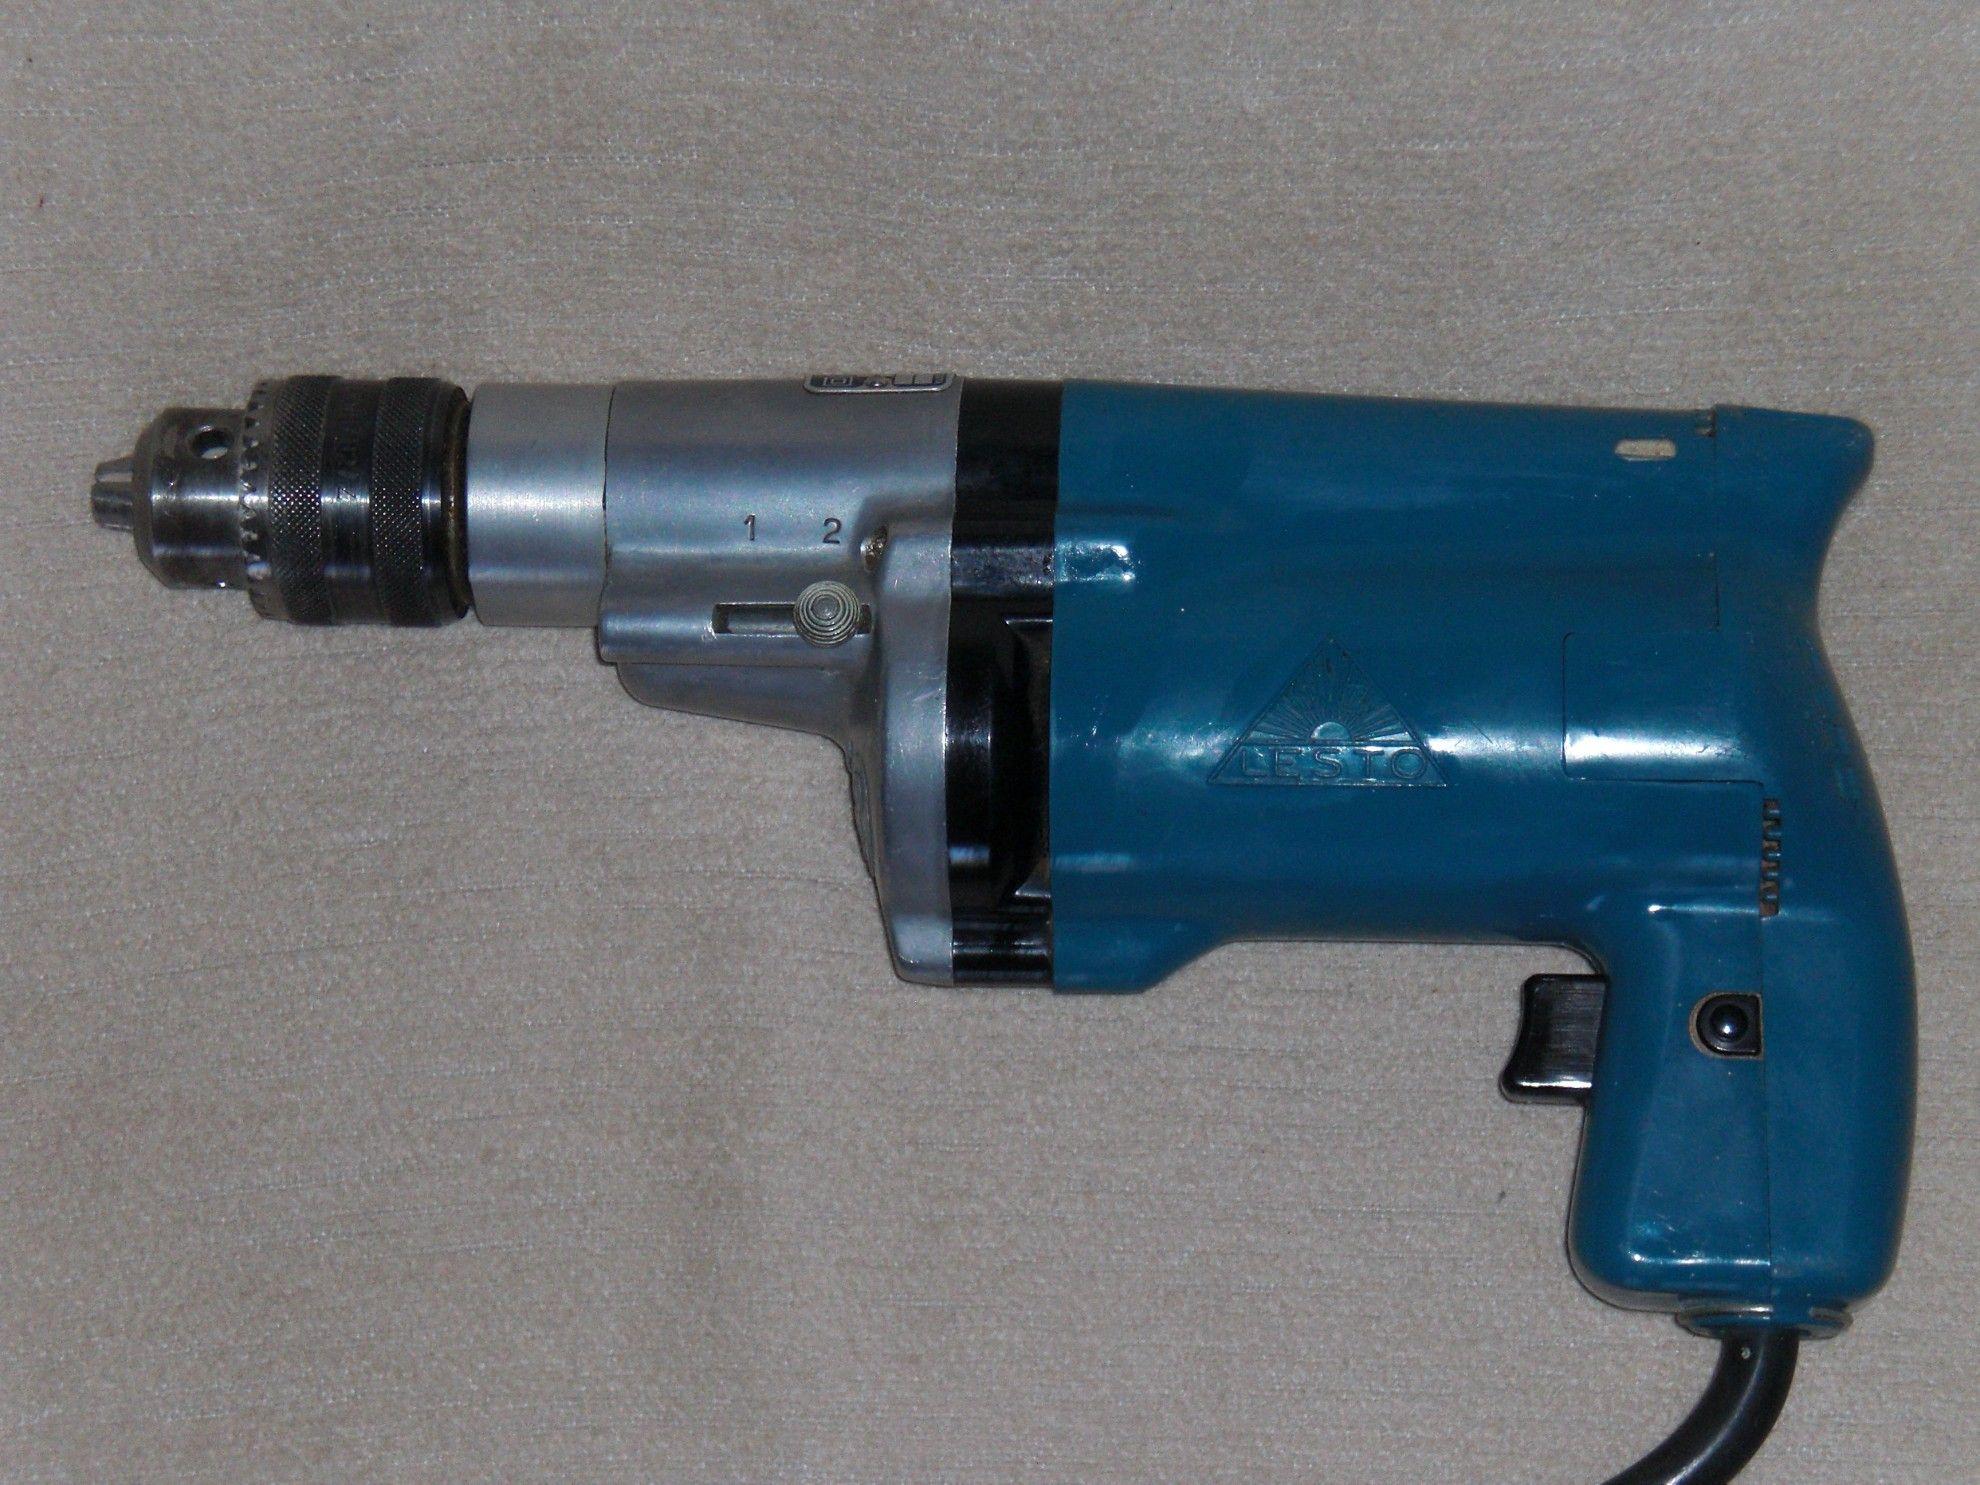 Alte Bohrmaschine LESTO Scintilla 280W drilling machine   muss es ...